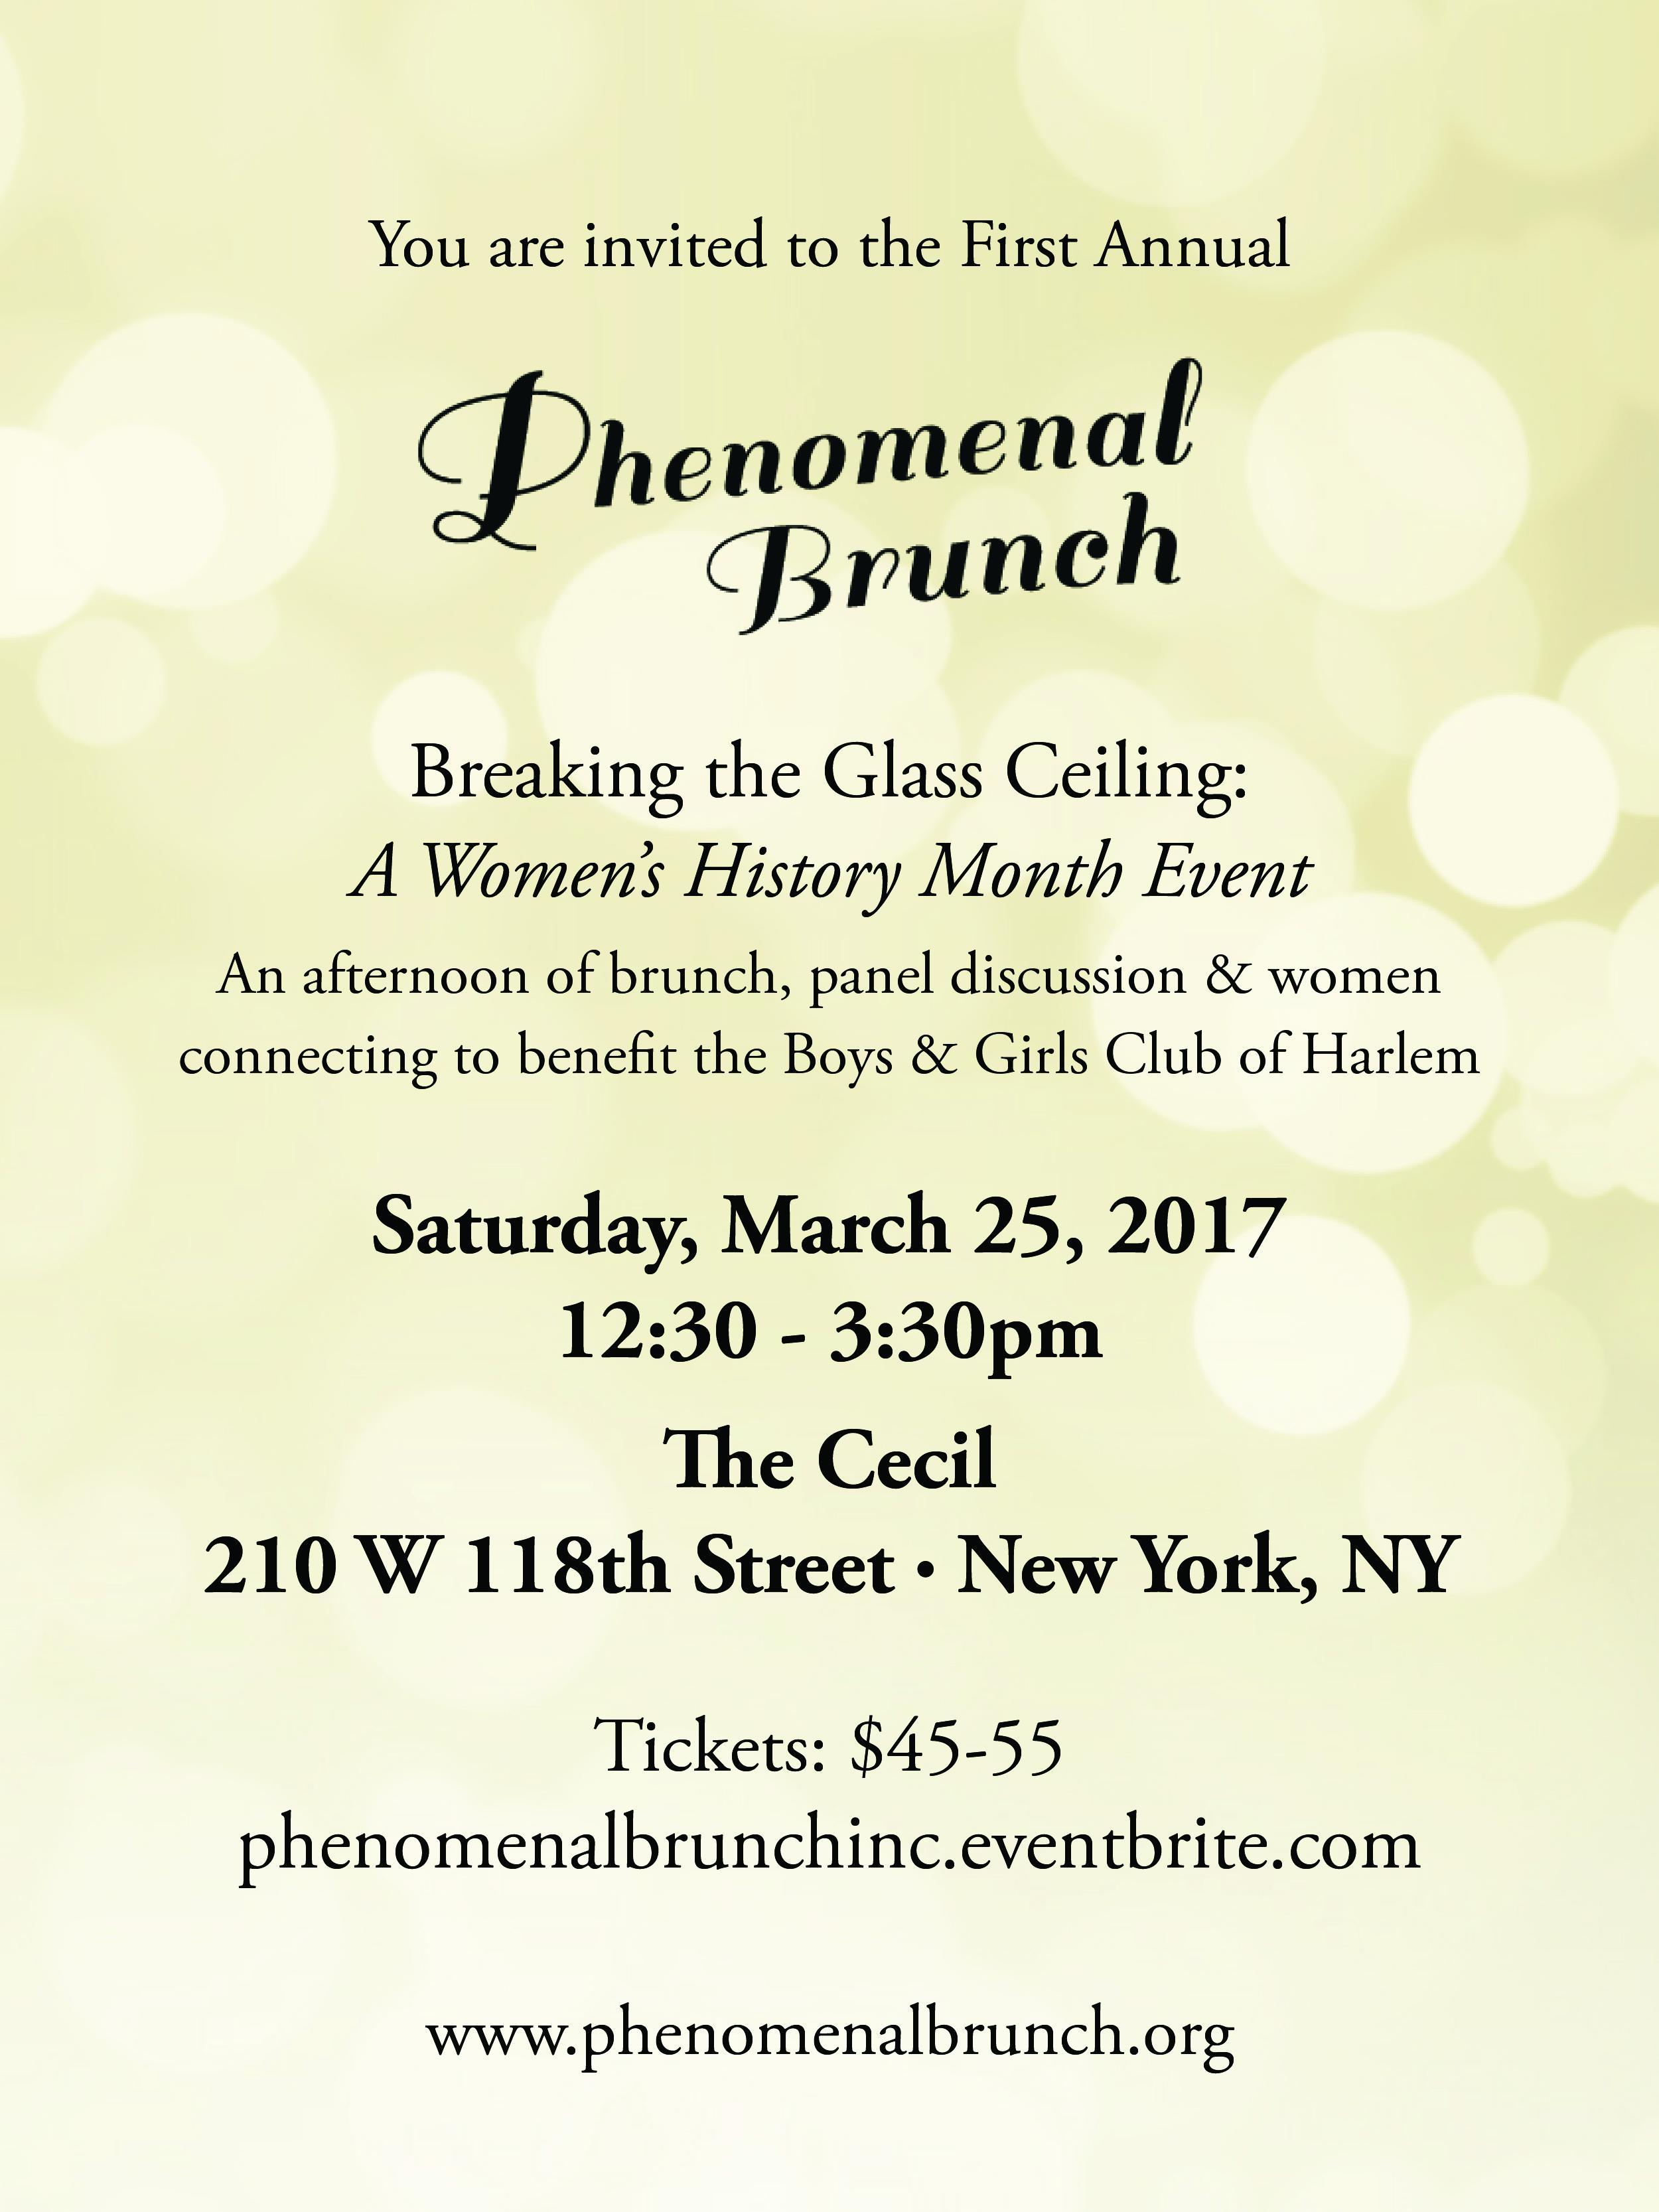 The First Annual Phenomenal Brunch invitation.